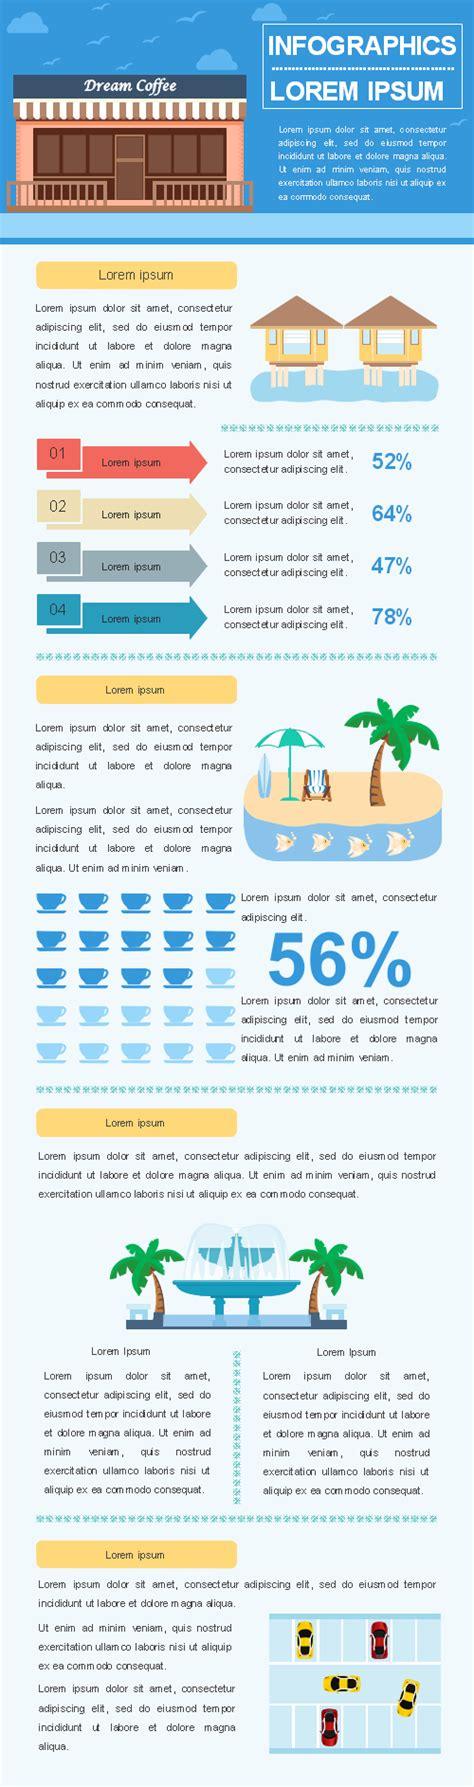 Travel Infographic Free Travel Infographic Templates Travel Infographic Template